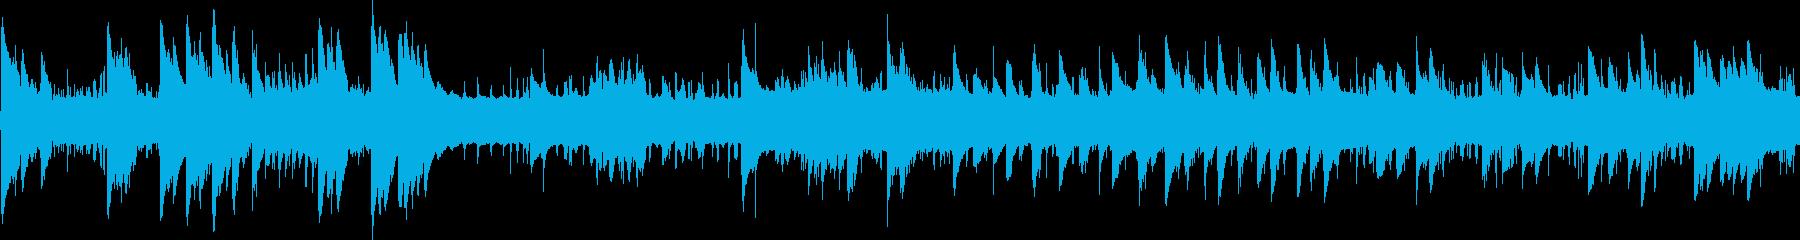 8bit爽快スペースファンタジー ループの再生済みの波形